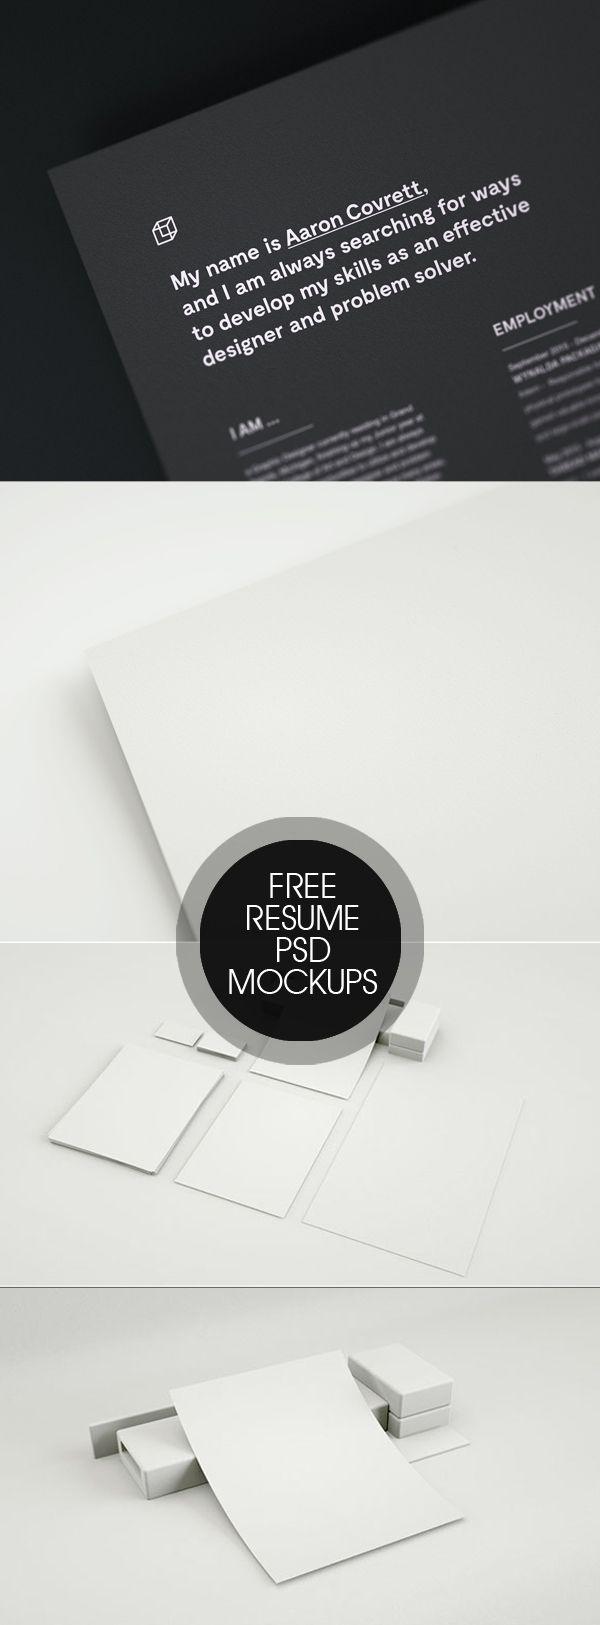 White apron mockup - Free Resume Close Up Mockup Psd Template